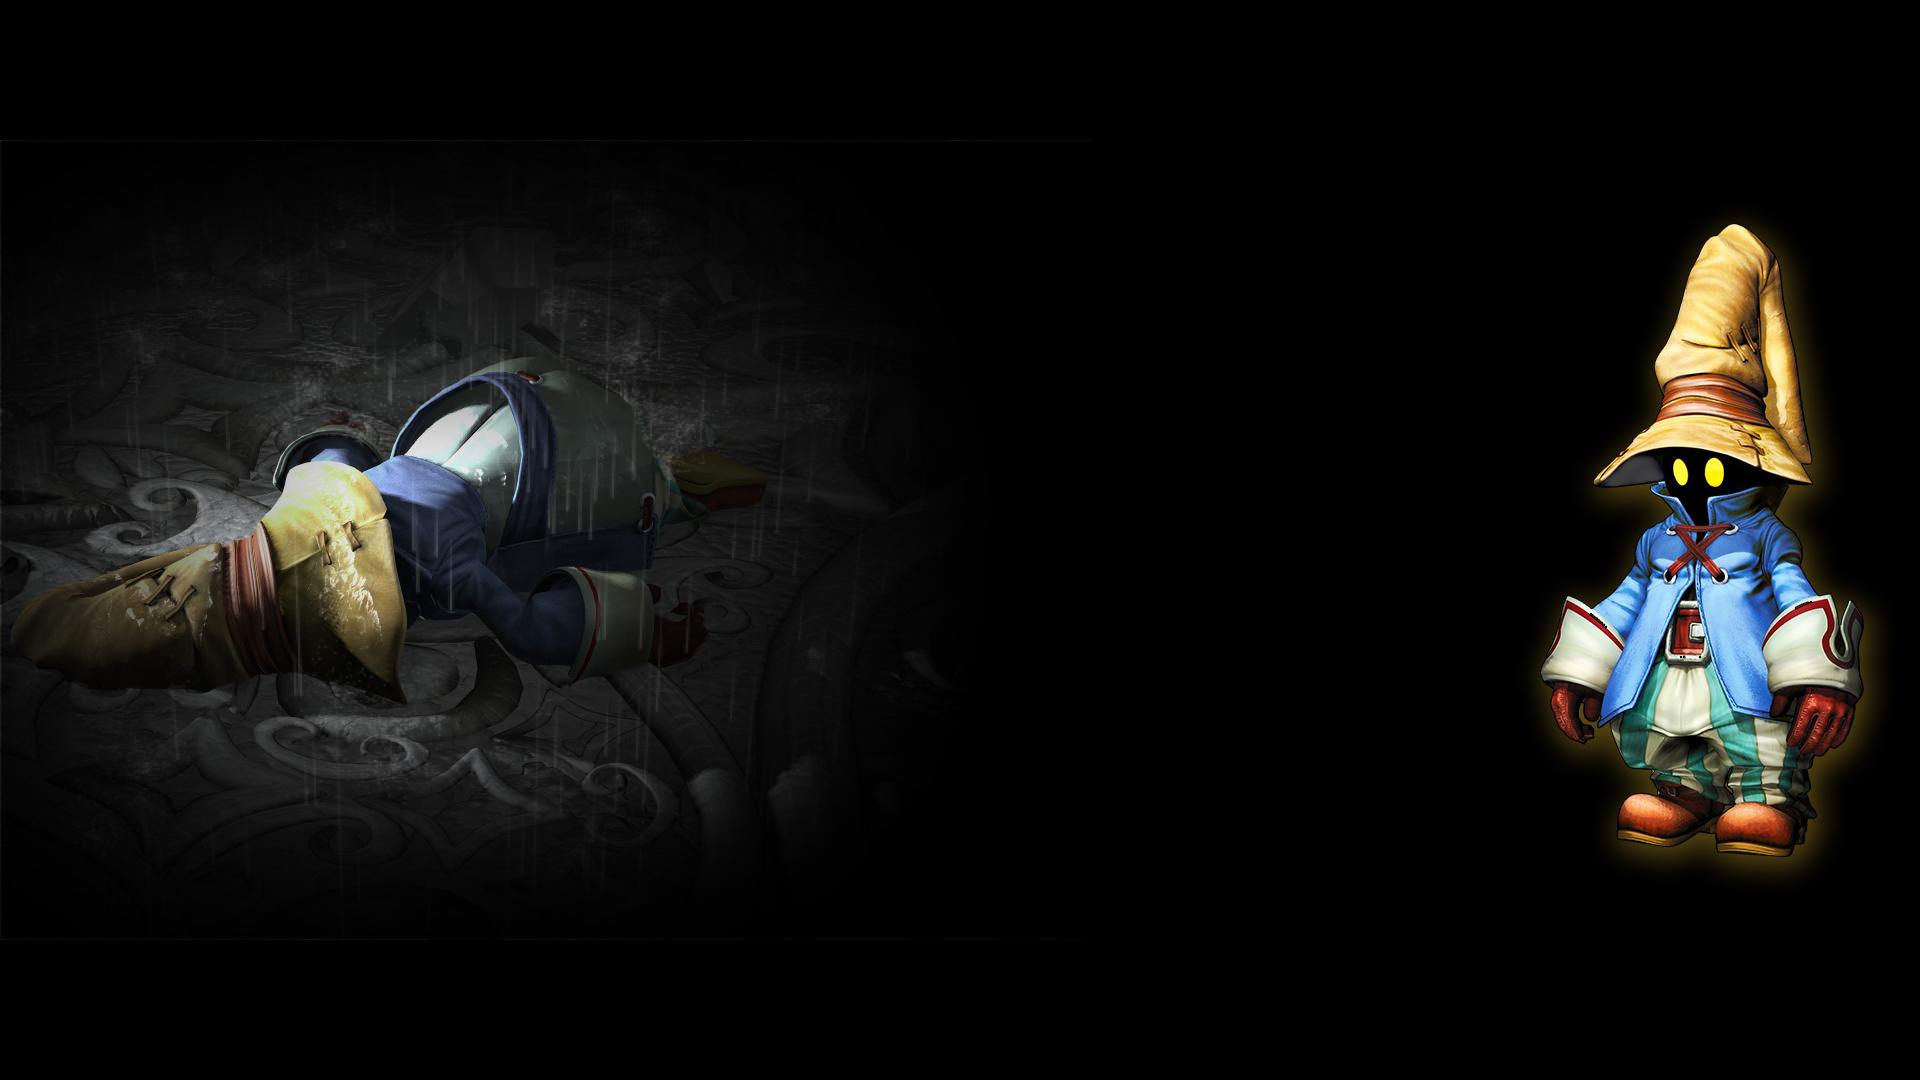 Final Fantasy Ix Wallpaper 005 Vivi Wallpapers Ethereal Games